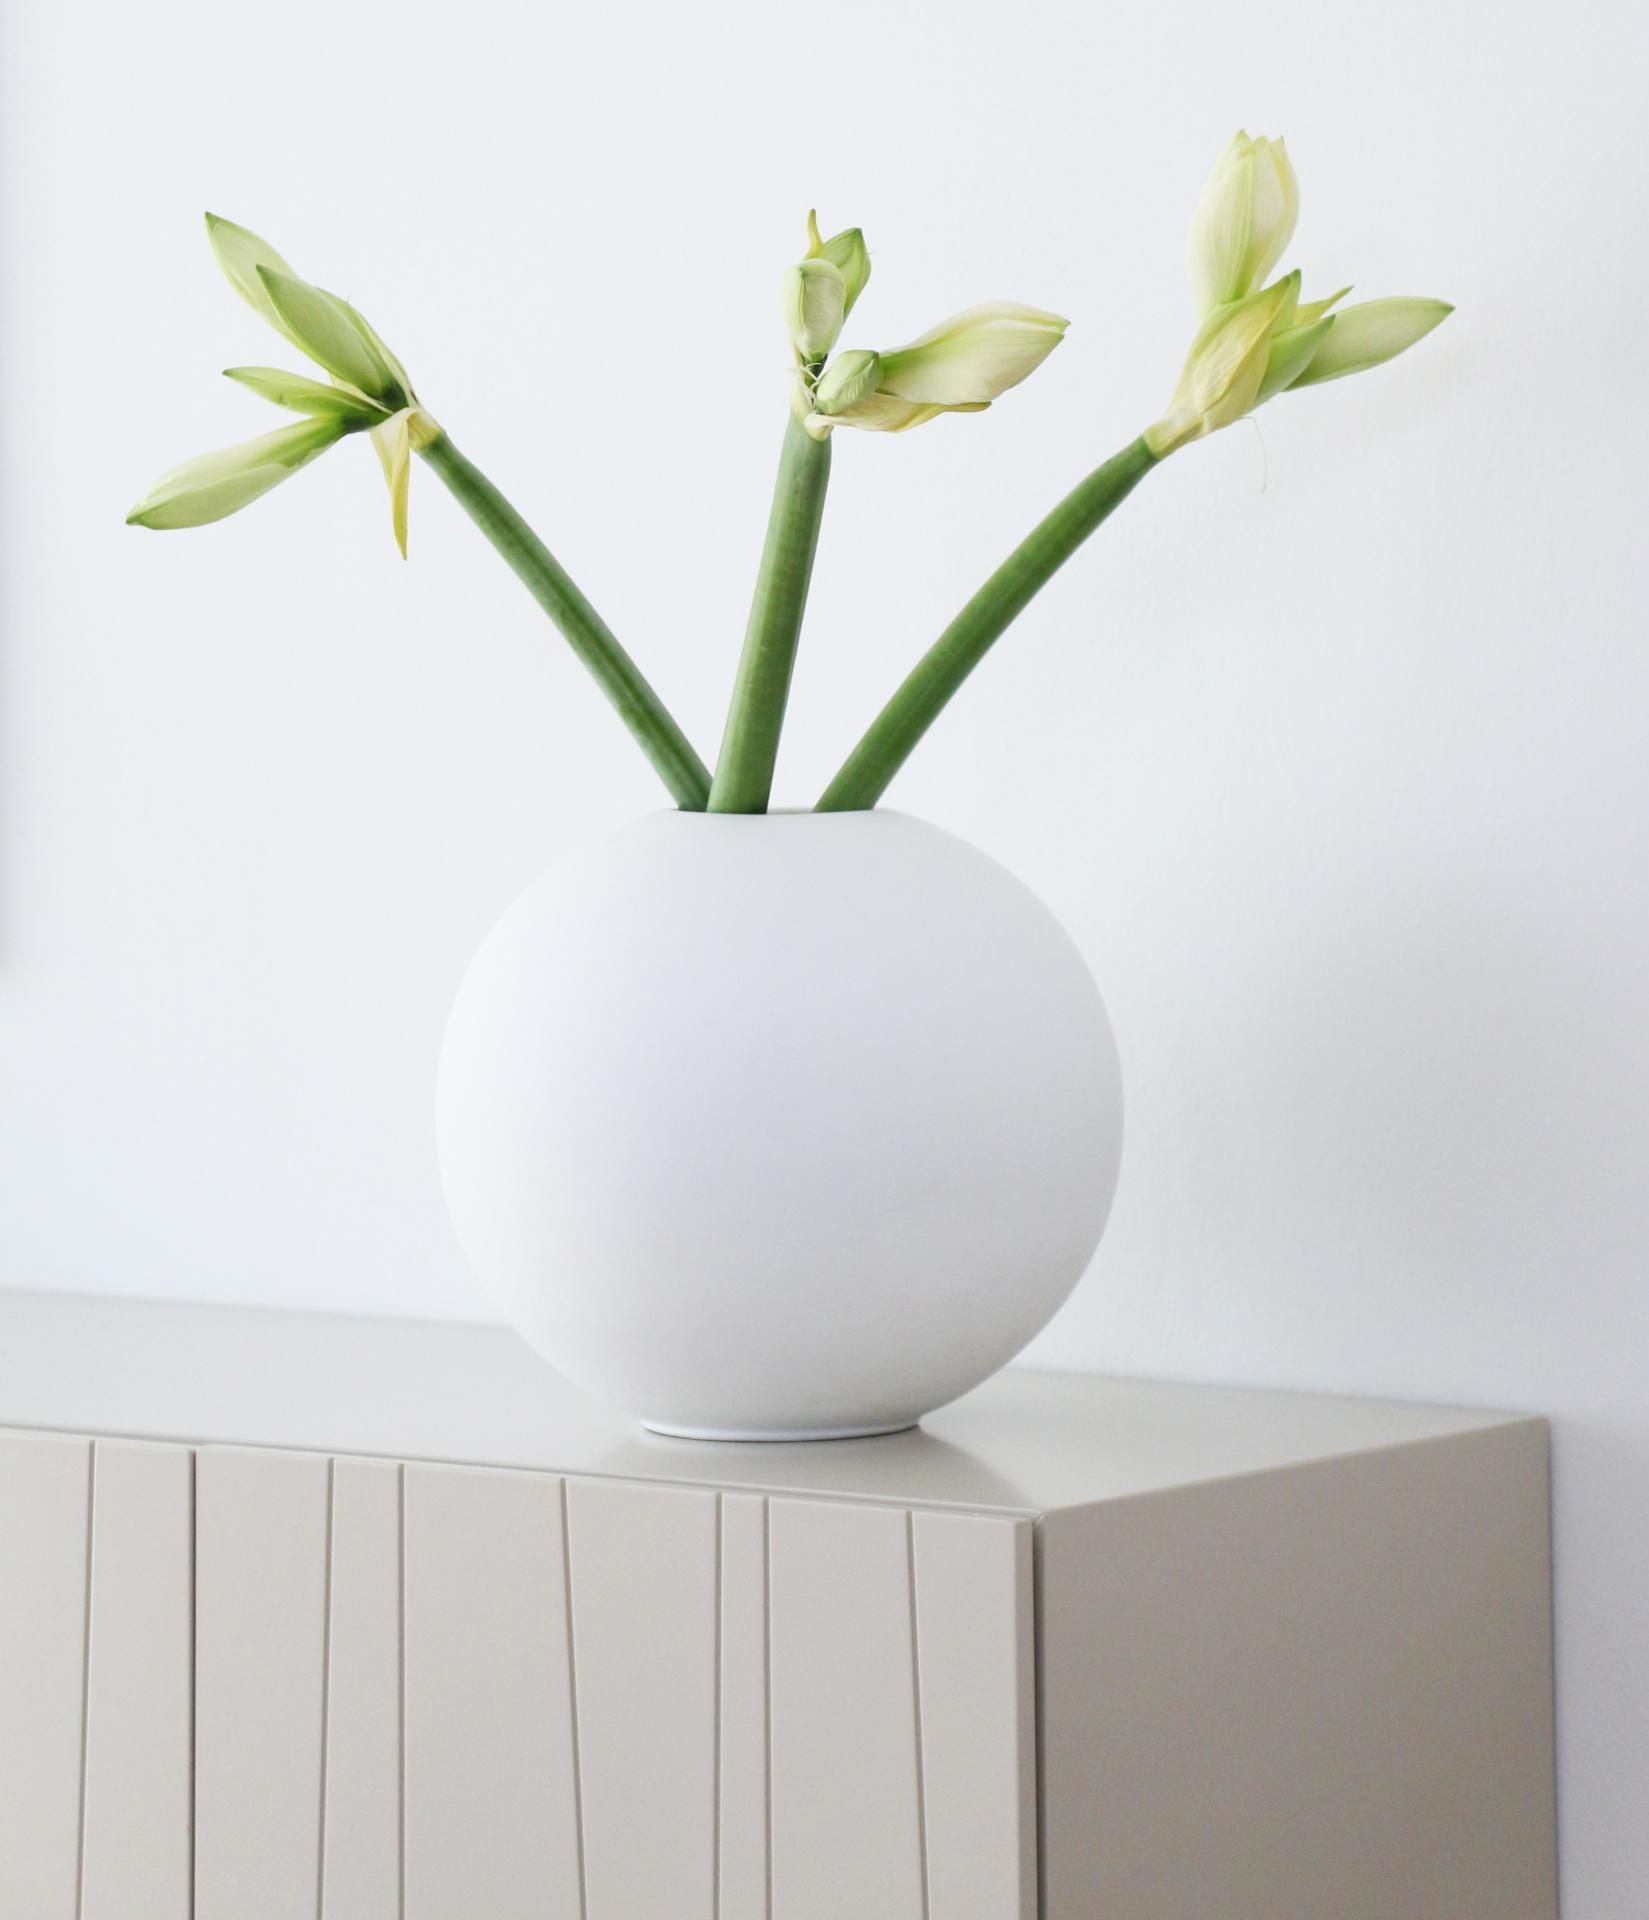 COOEE Design Kulatá váza Ball White 30 cm, bílá barva, keramika